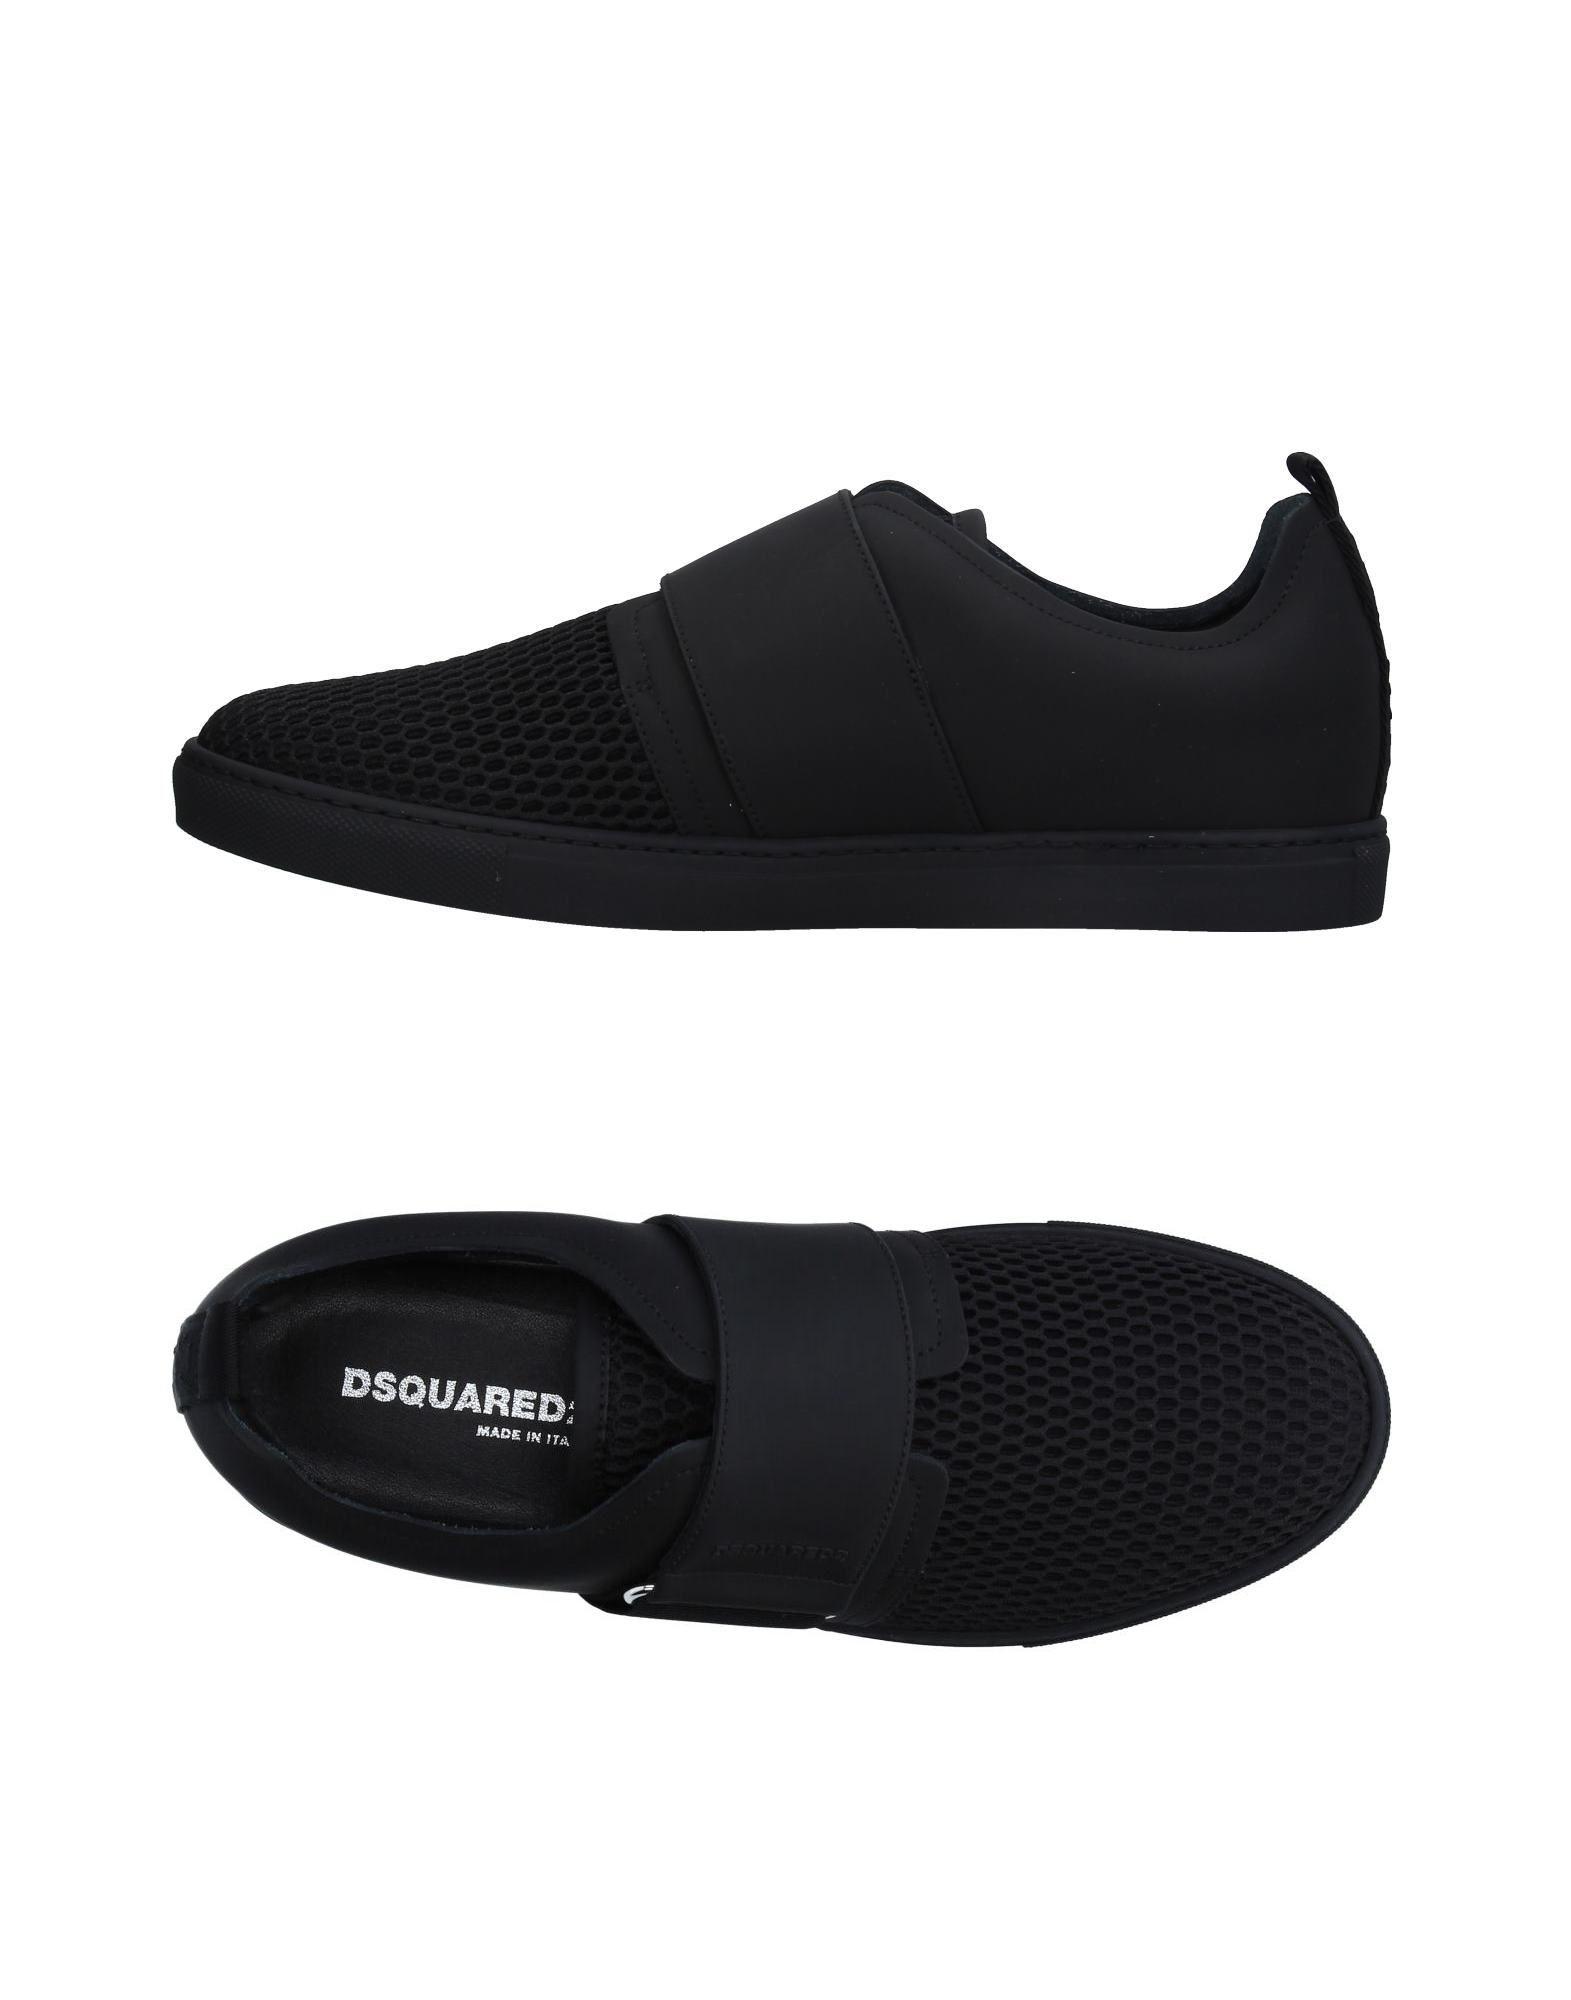 Dsquared2 Sneakers Herren  11262882RH Gute Qualität beliebte Schuhe